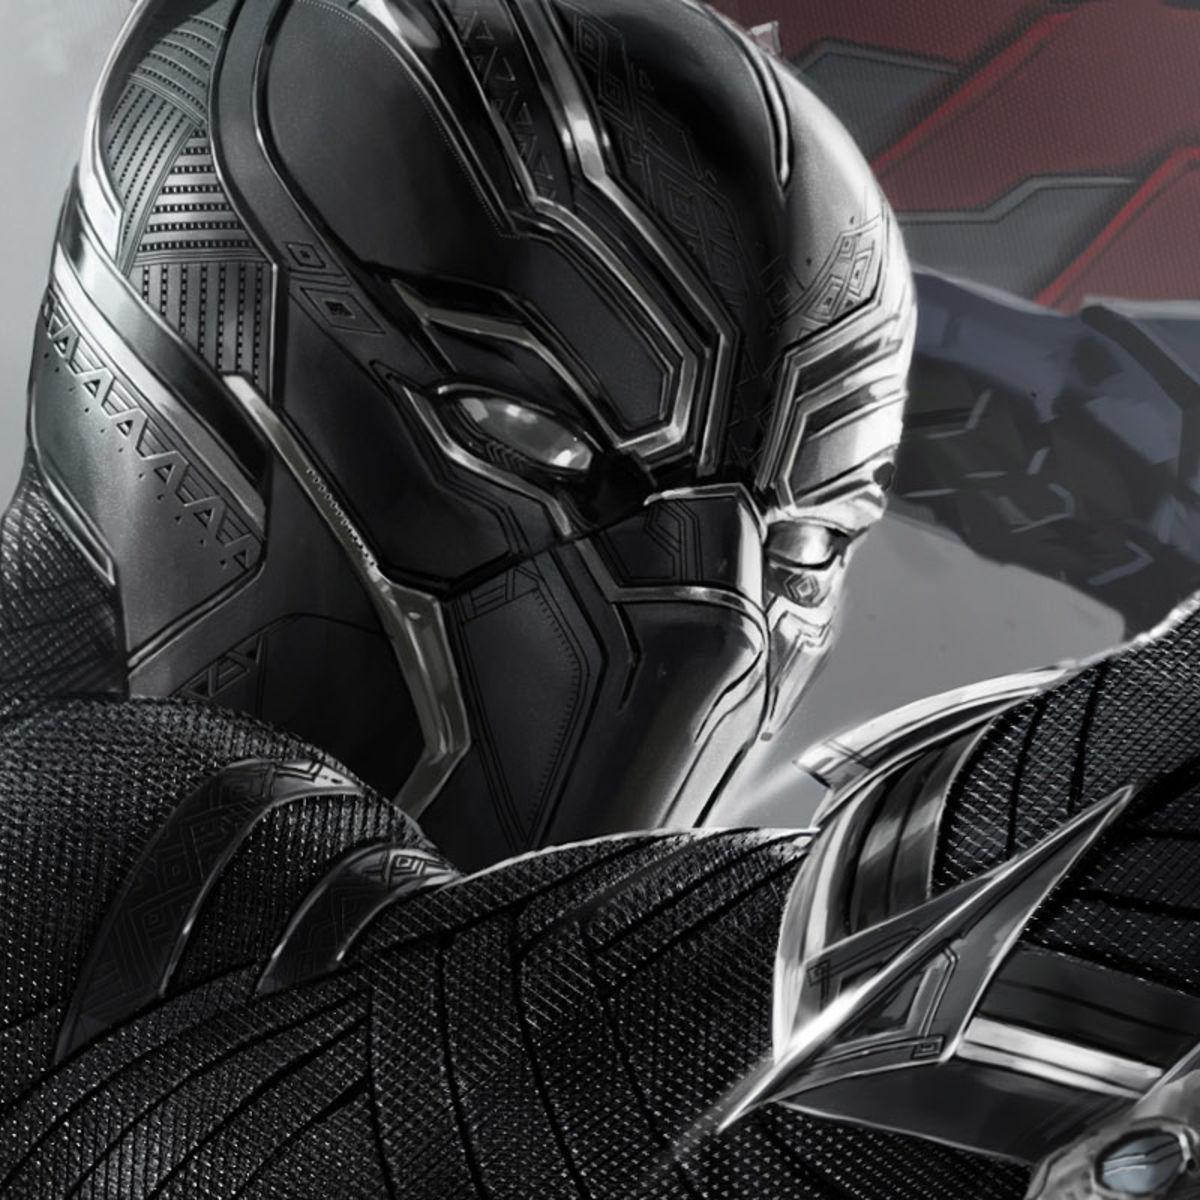 Black-Panther-Captain-America-Civil-War-concept-art.jpg